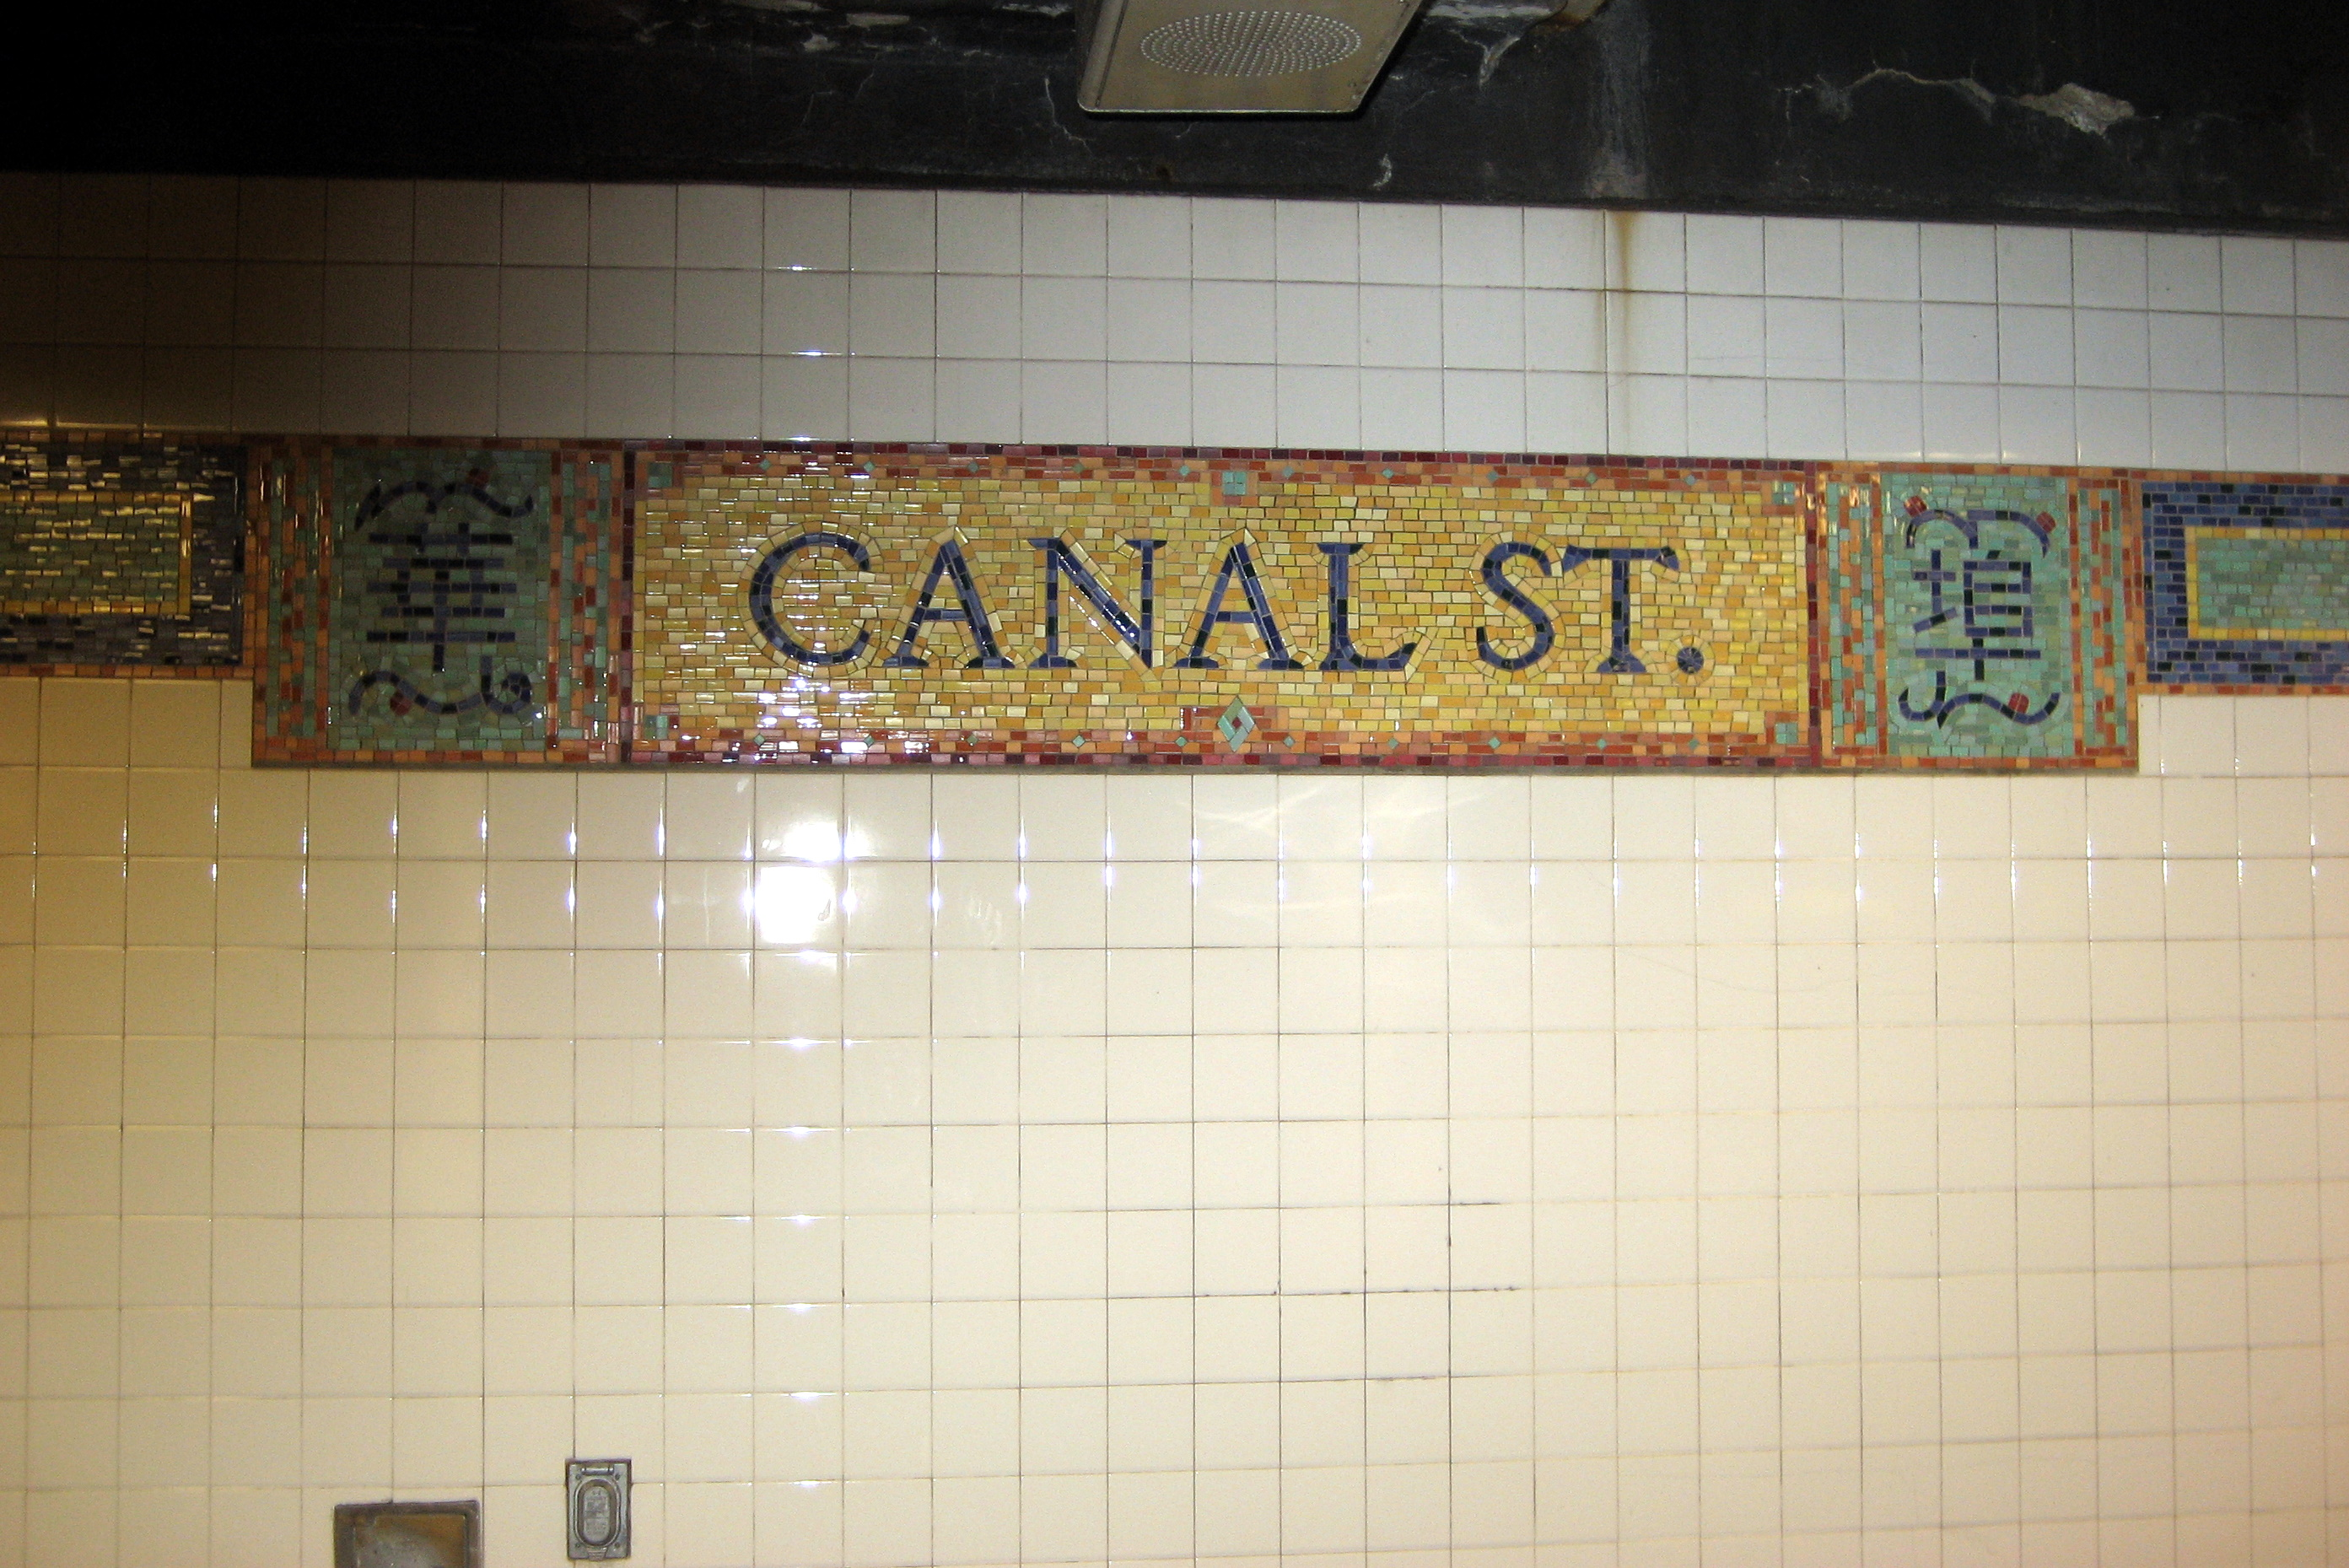 Chinatown nyc subway directions paris